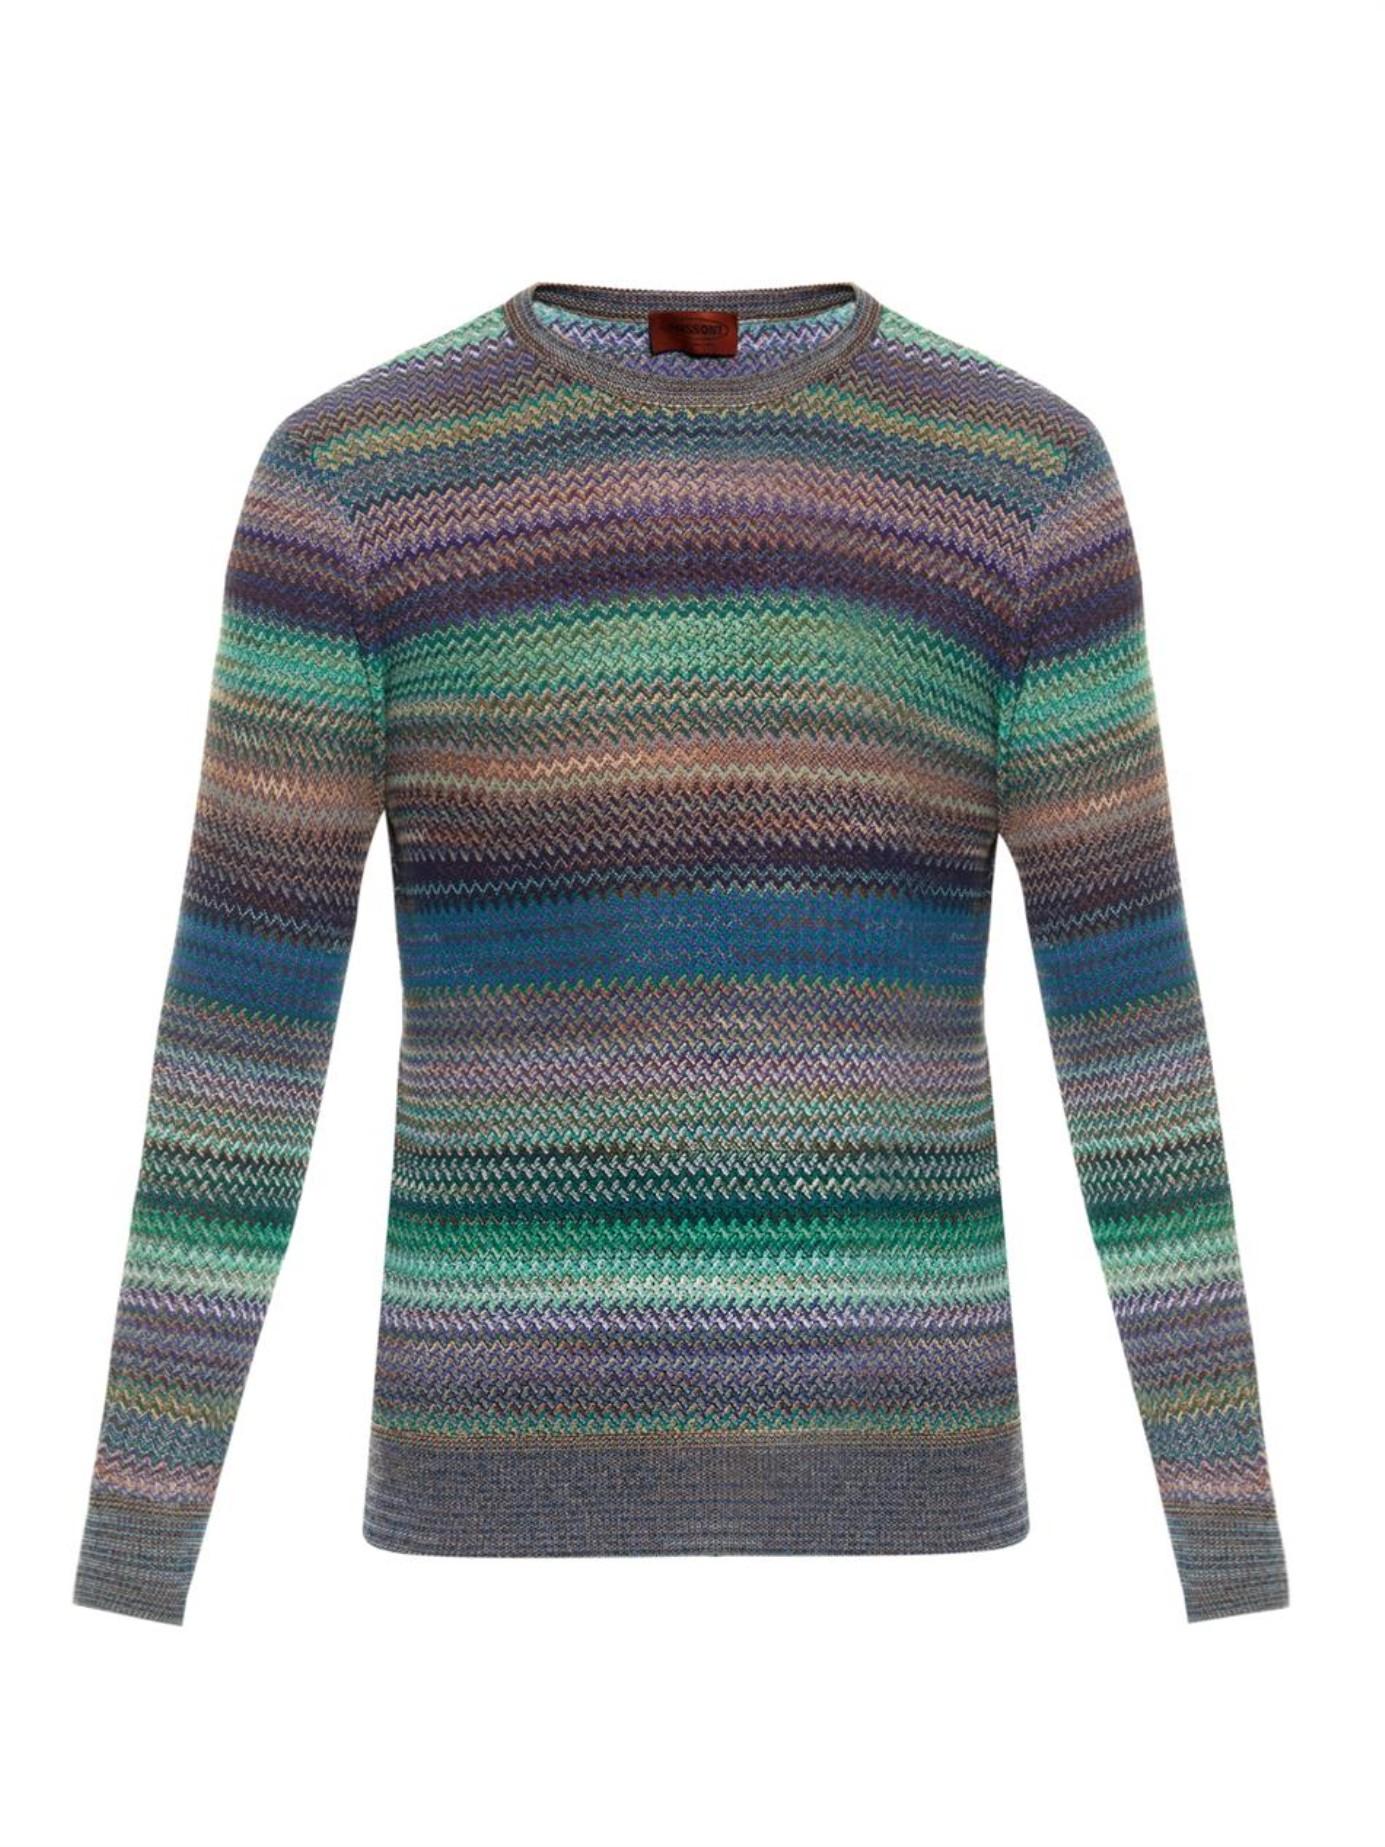 Knit Sweater With Zig Zag Pattern : Missoni zigzag crochet knit sweater in multicolor for men